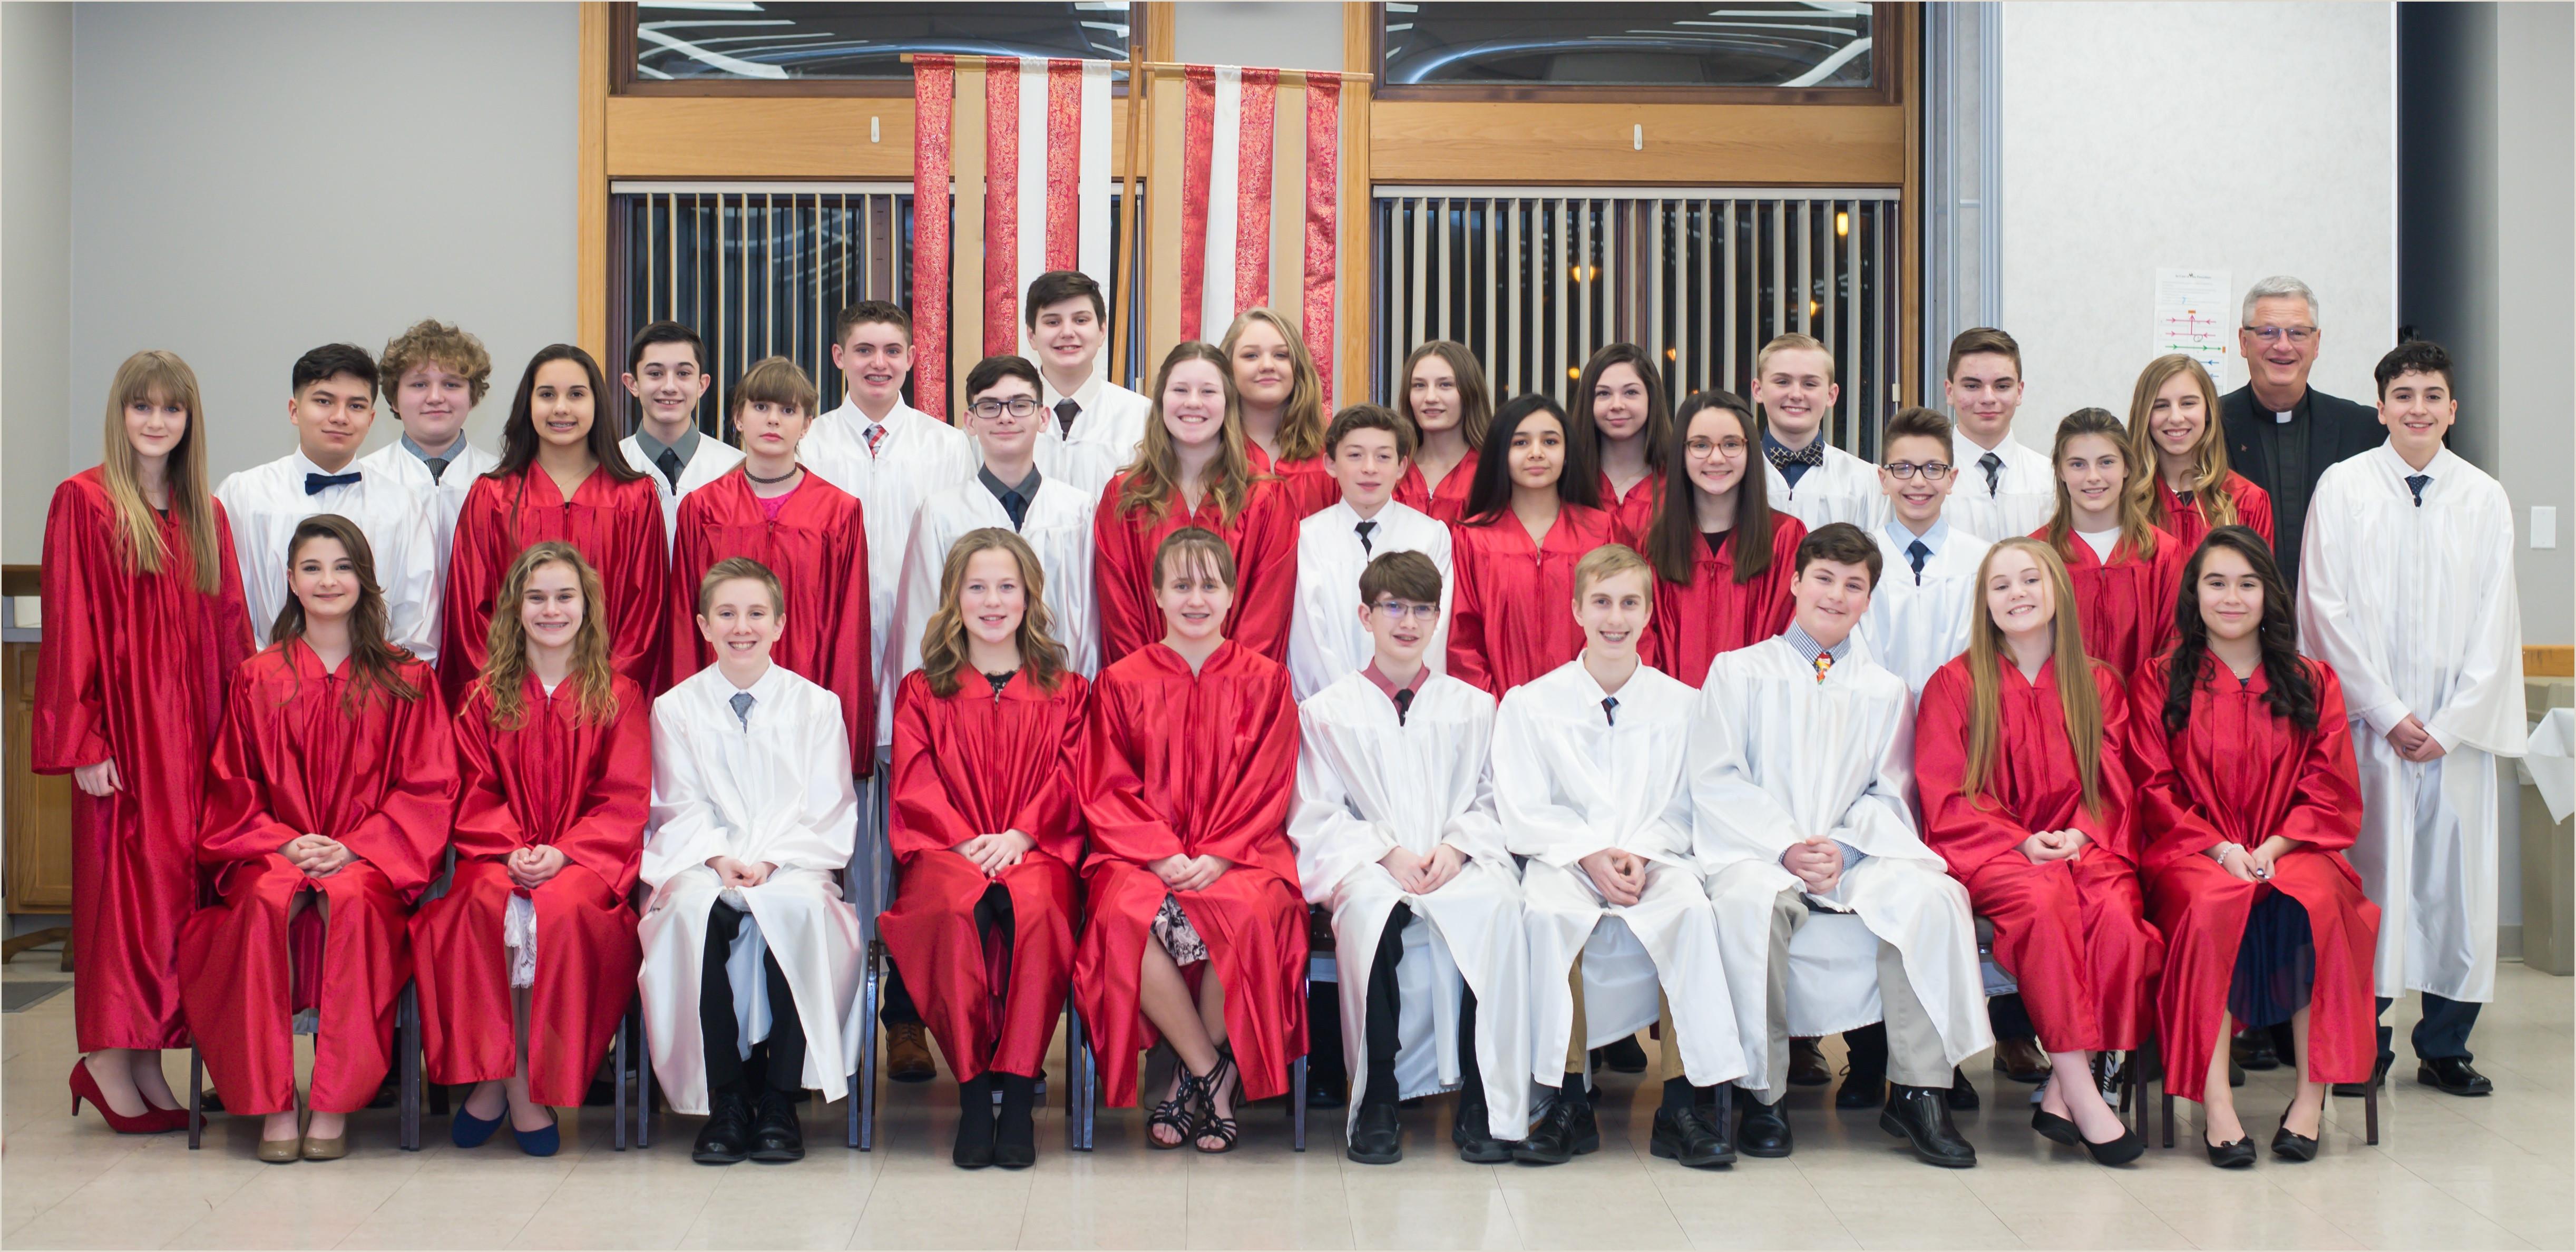 St Ann Catholic Church Confirmation Preparation